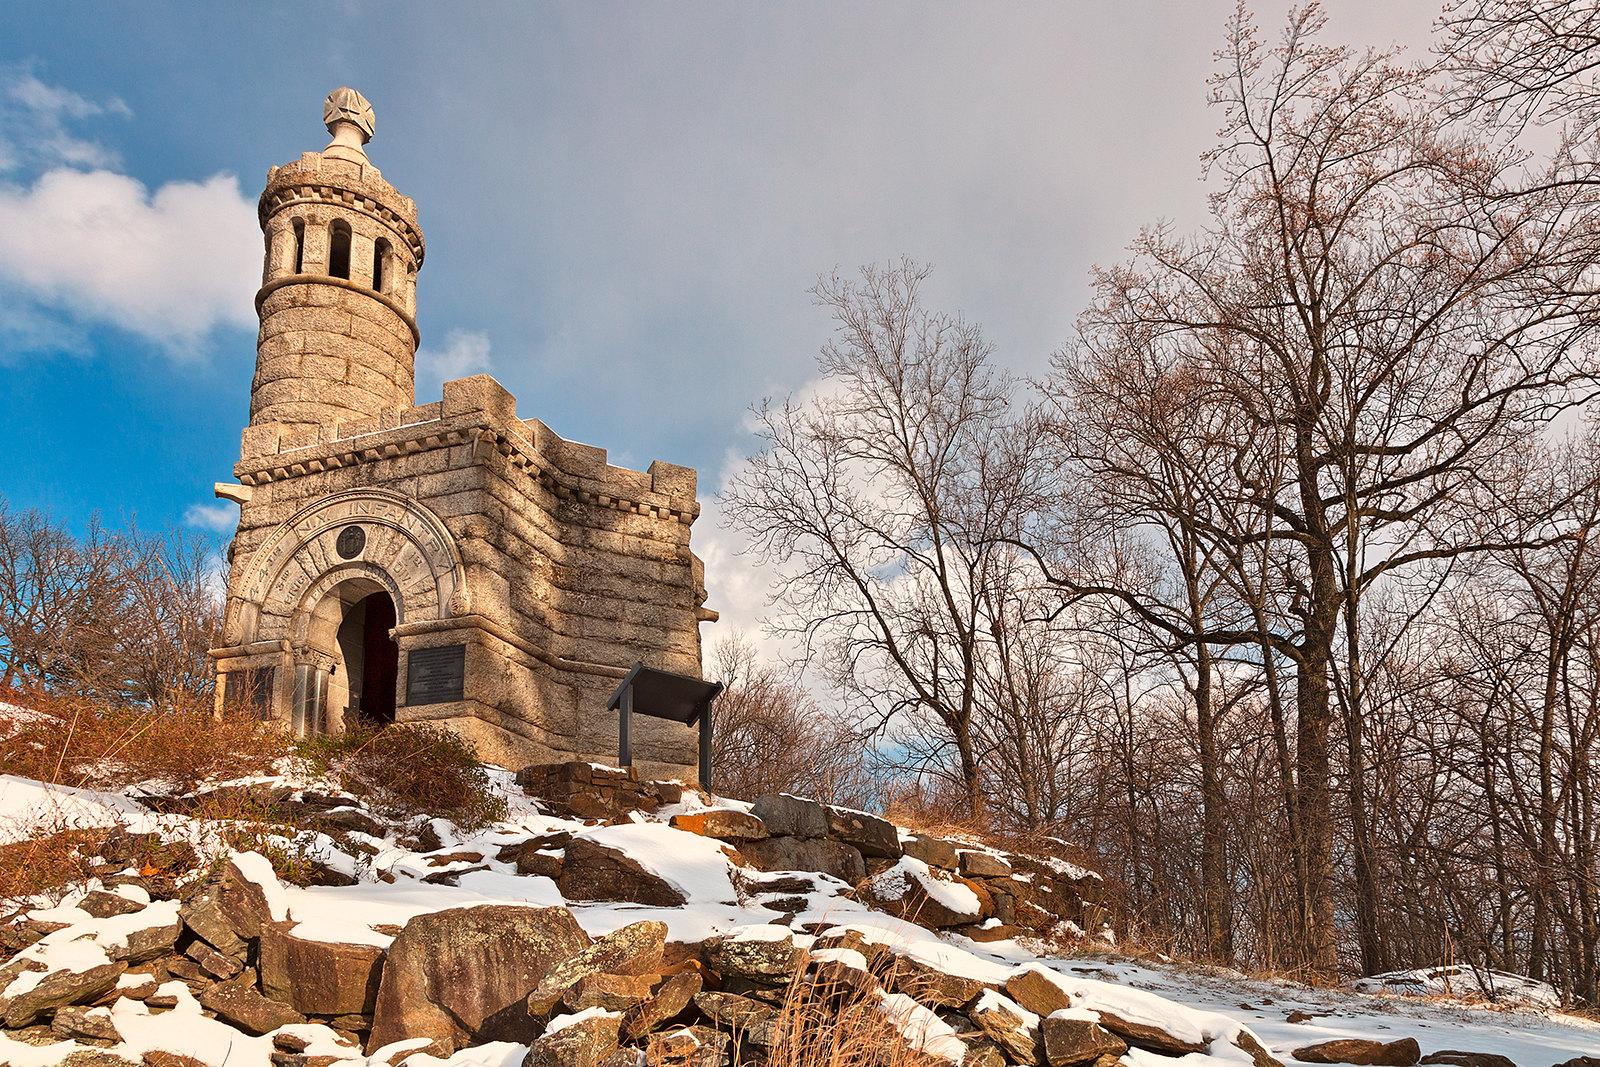 15 Things to do in Gettysburg, Pennsylvania